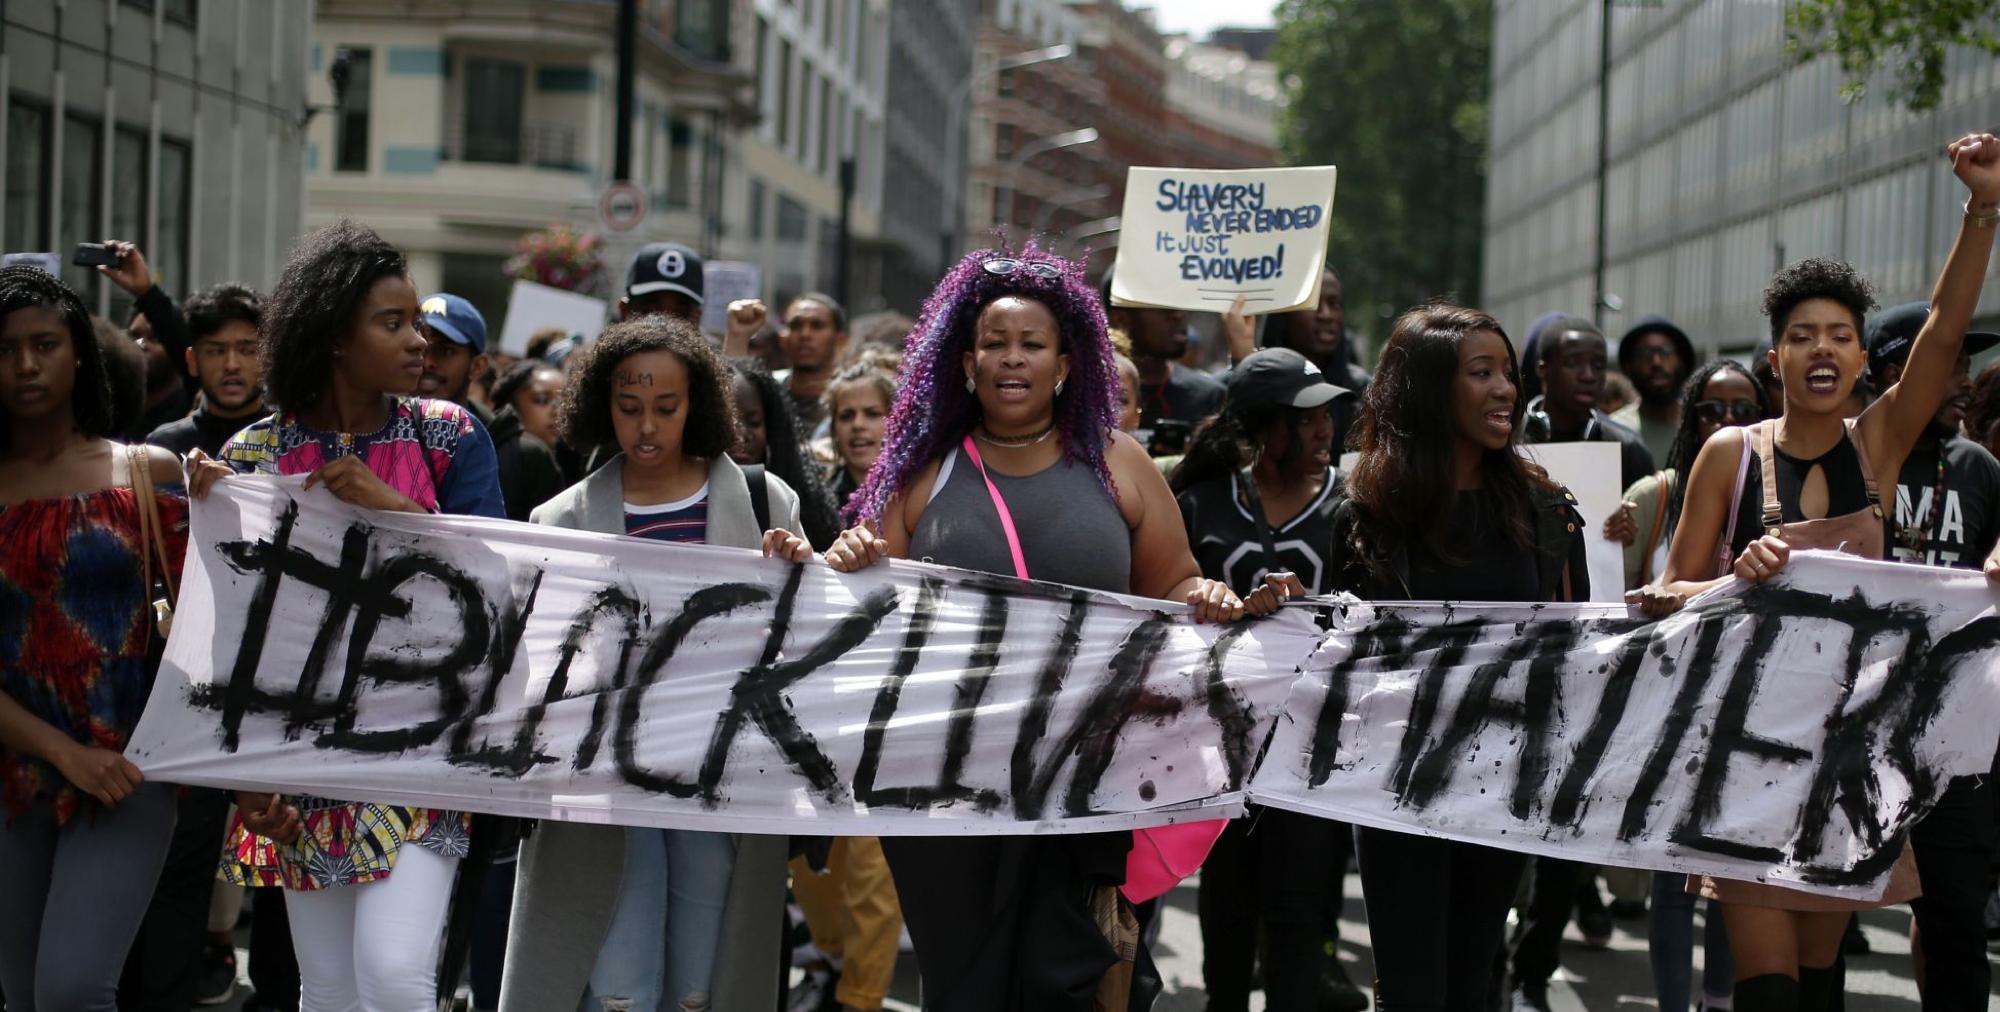 Photo By Black Lives Matter